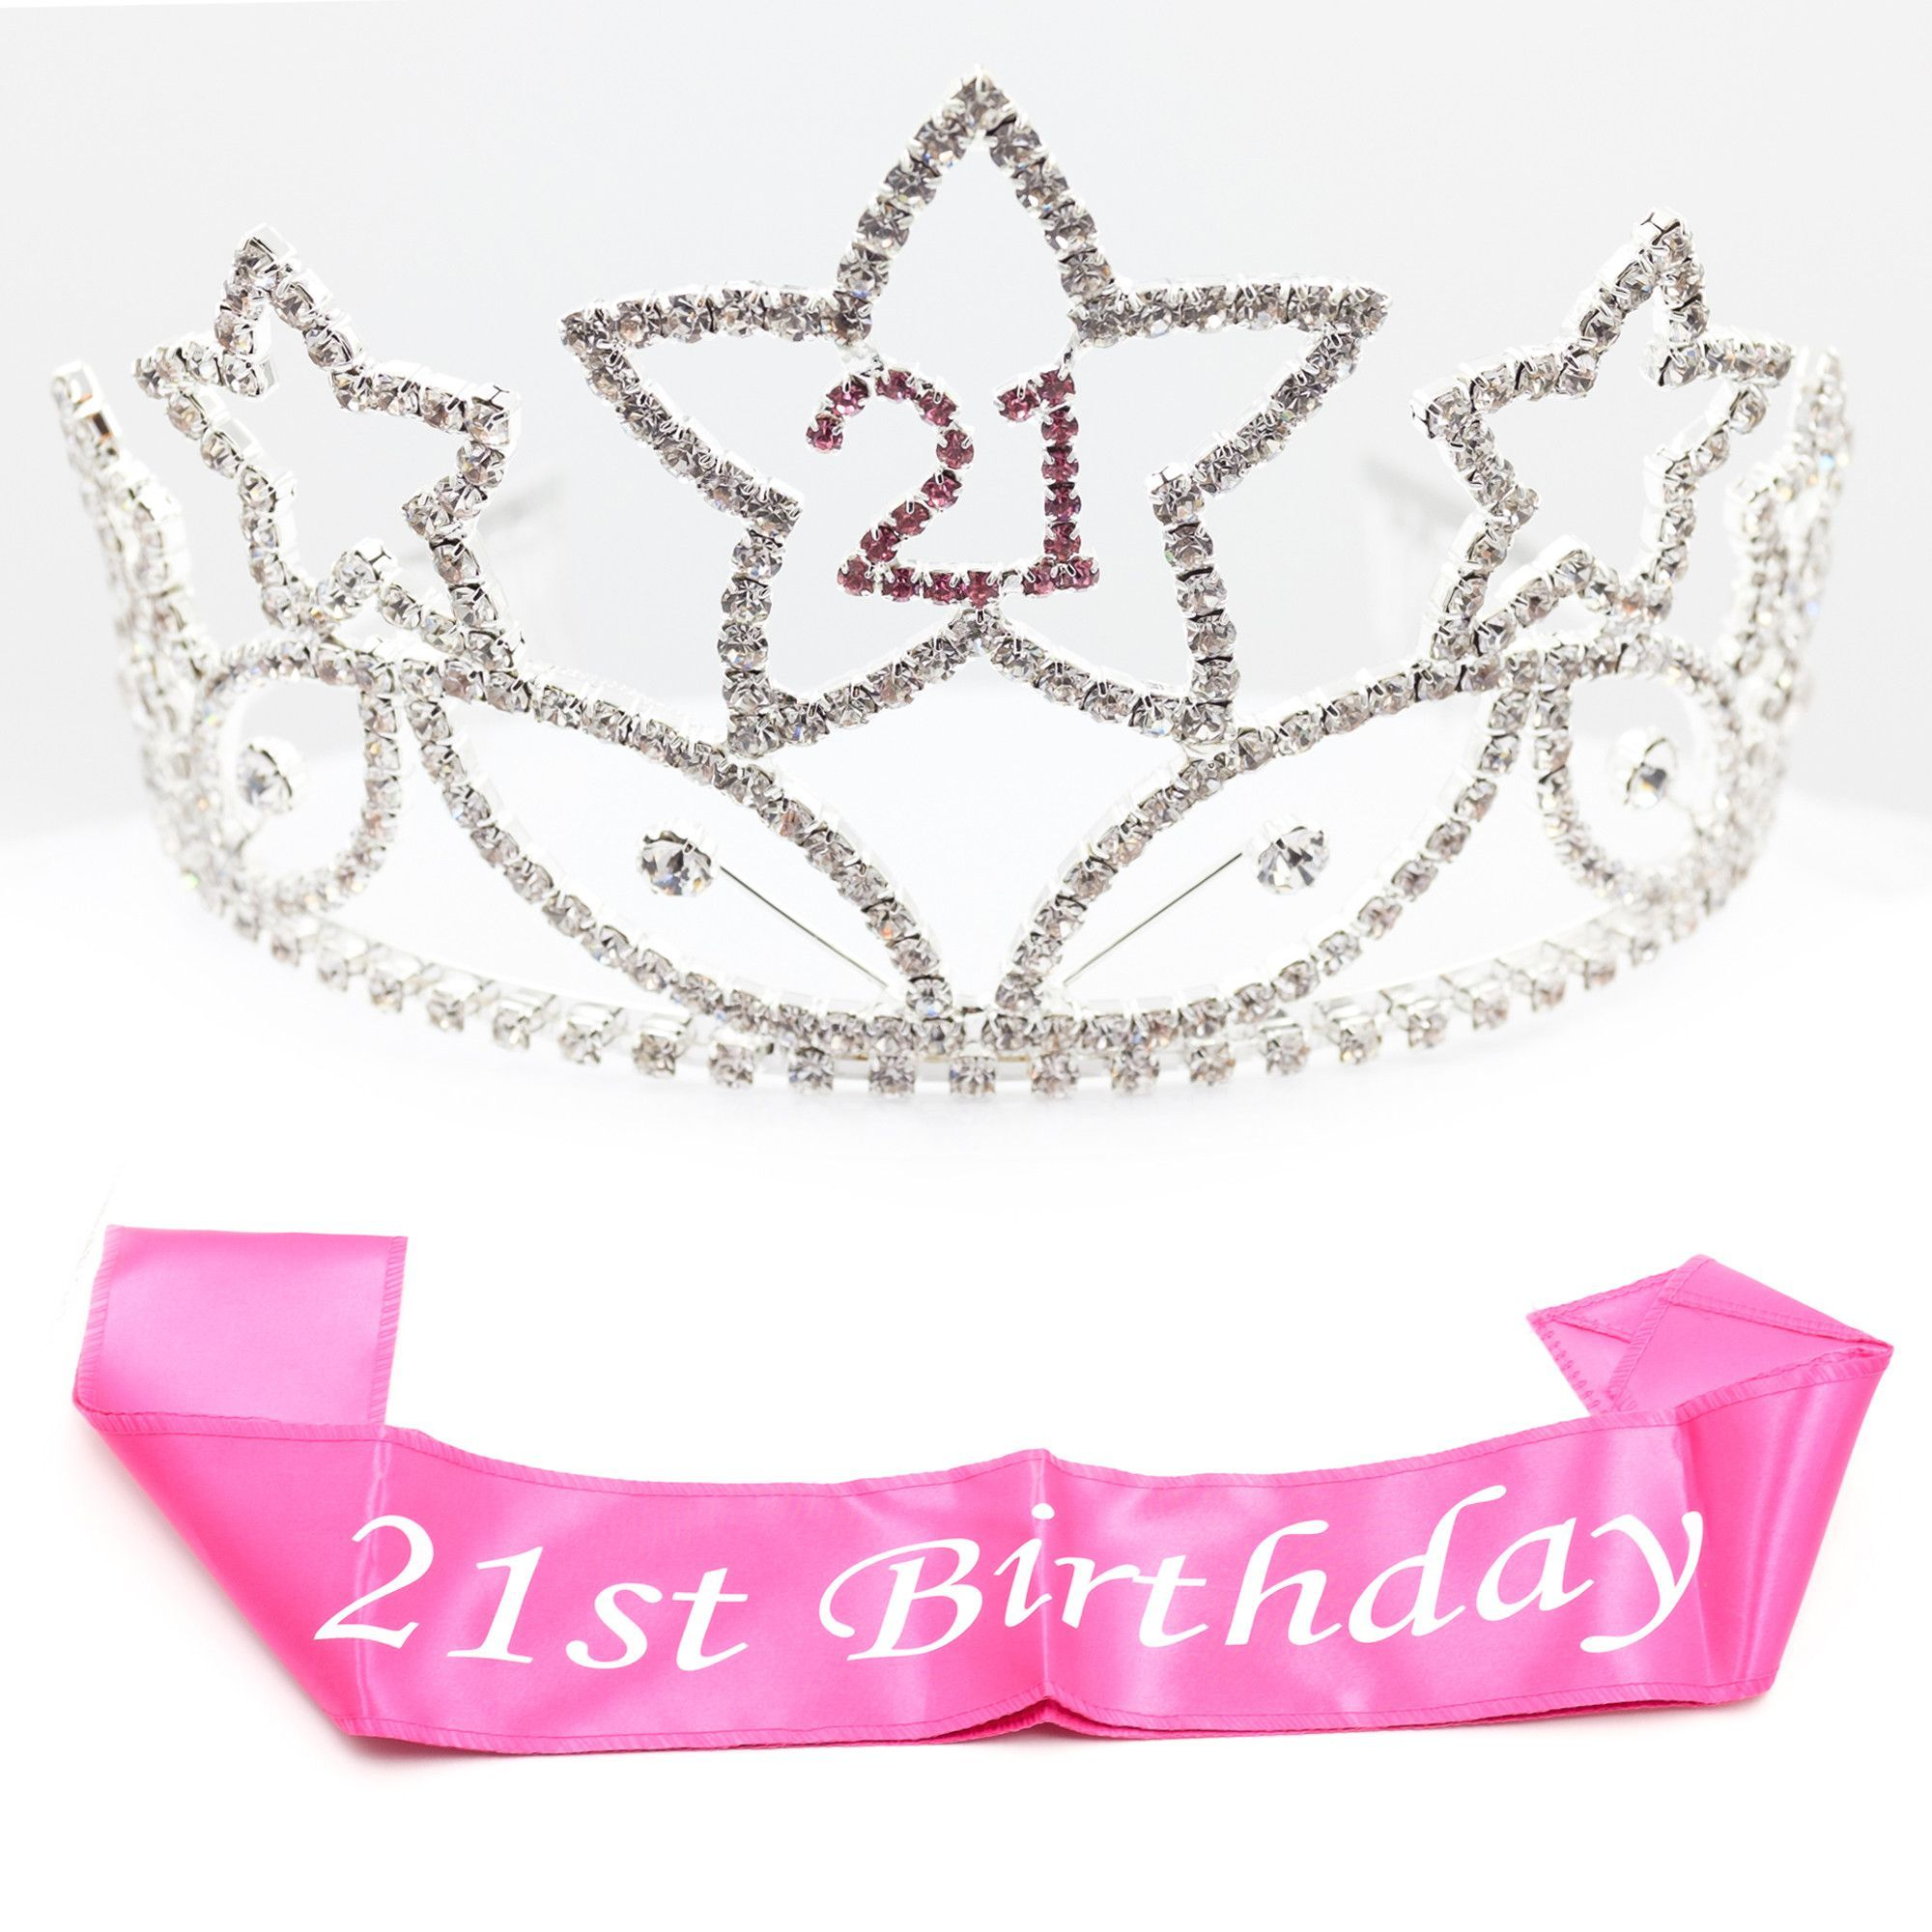 21st Birthday Tiara And Sash